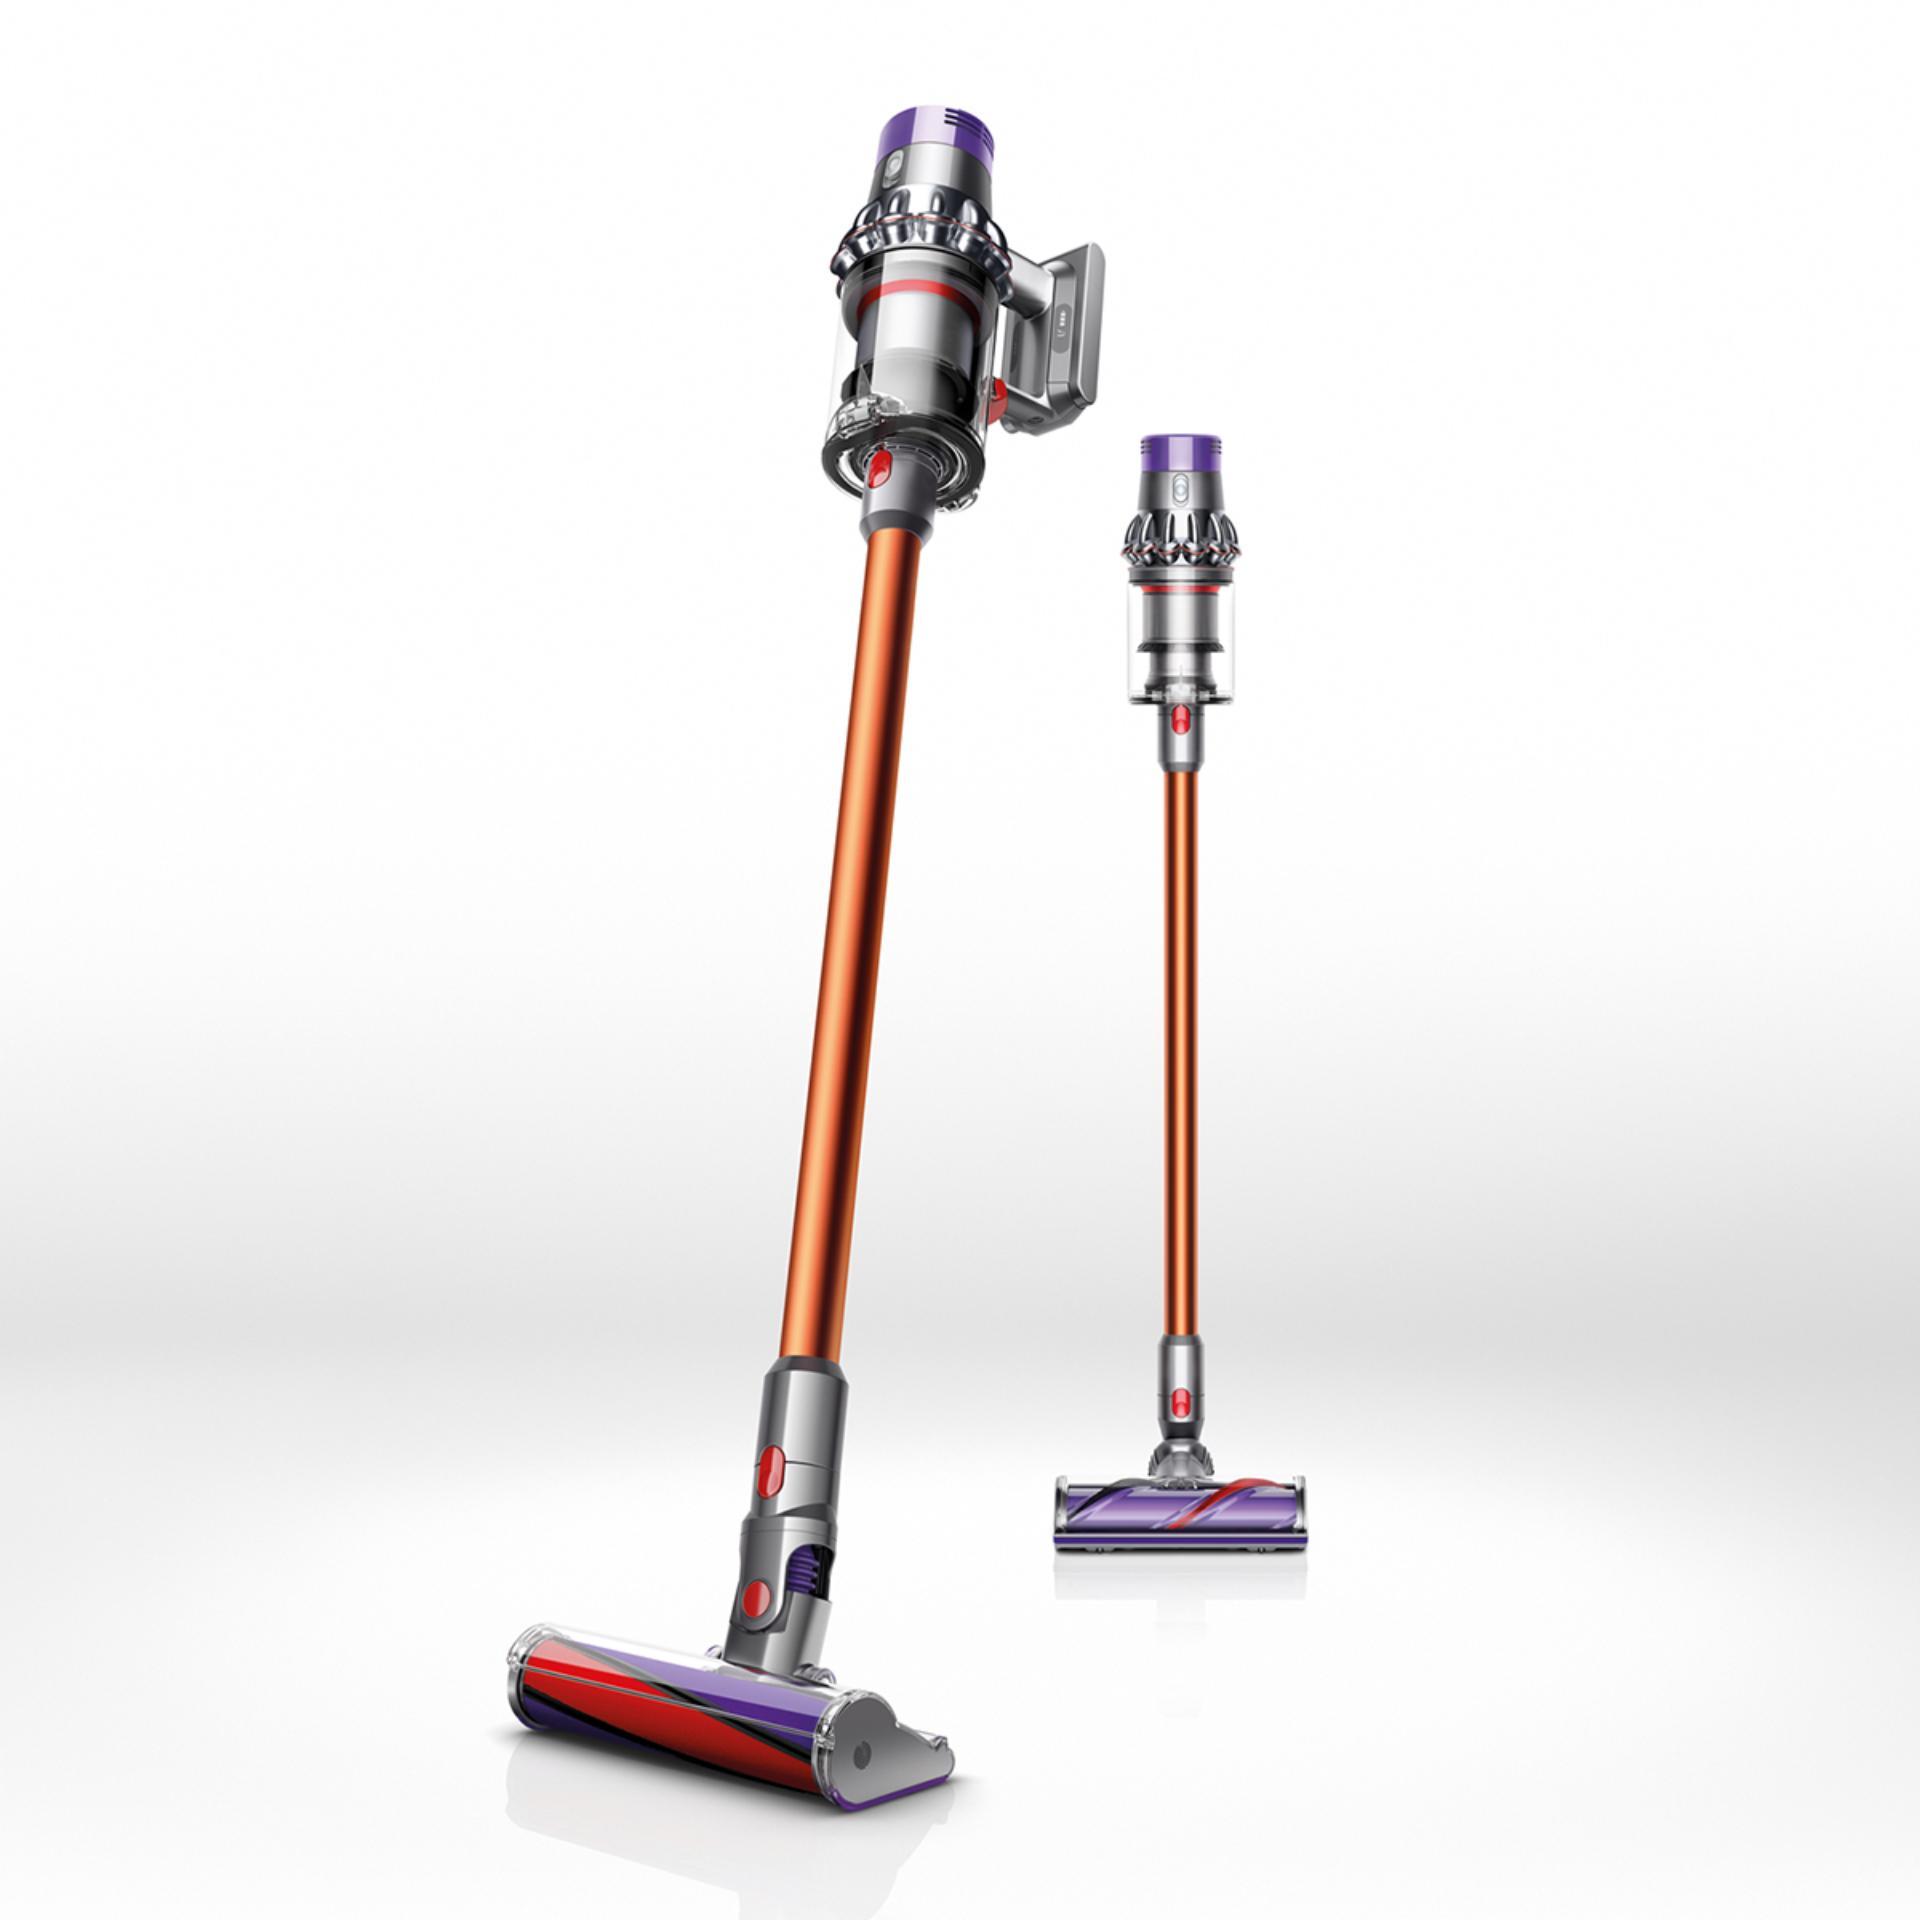 Cordfree Vacuums